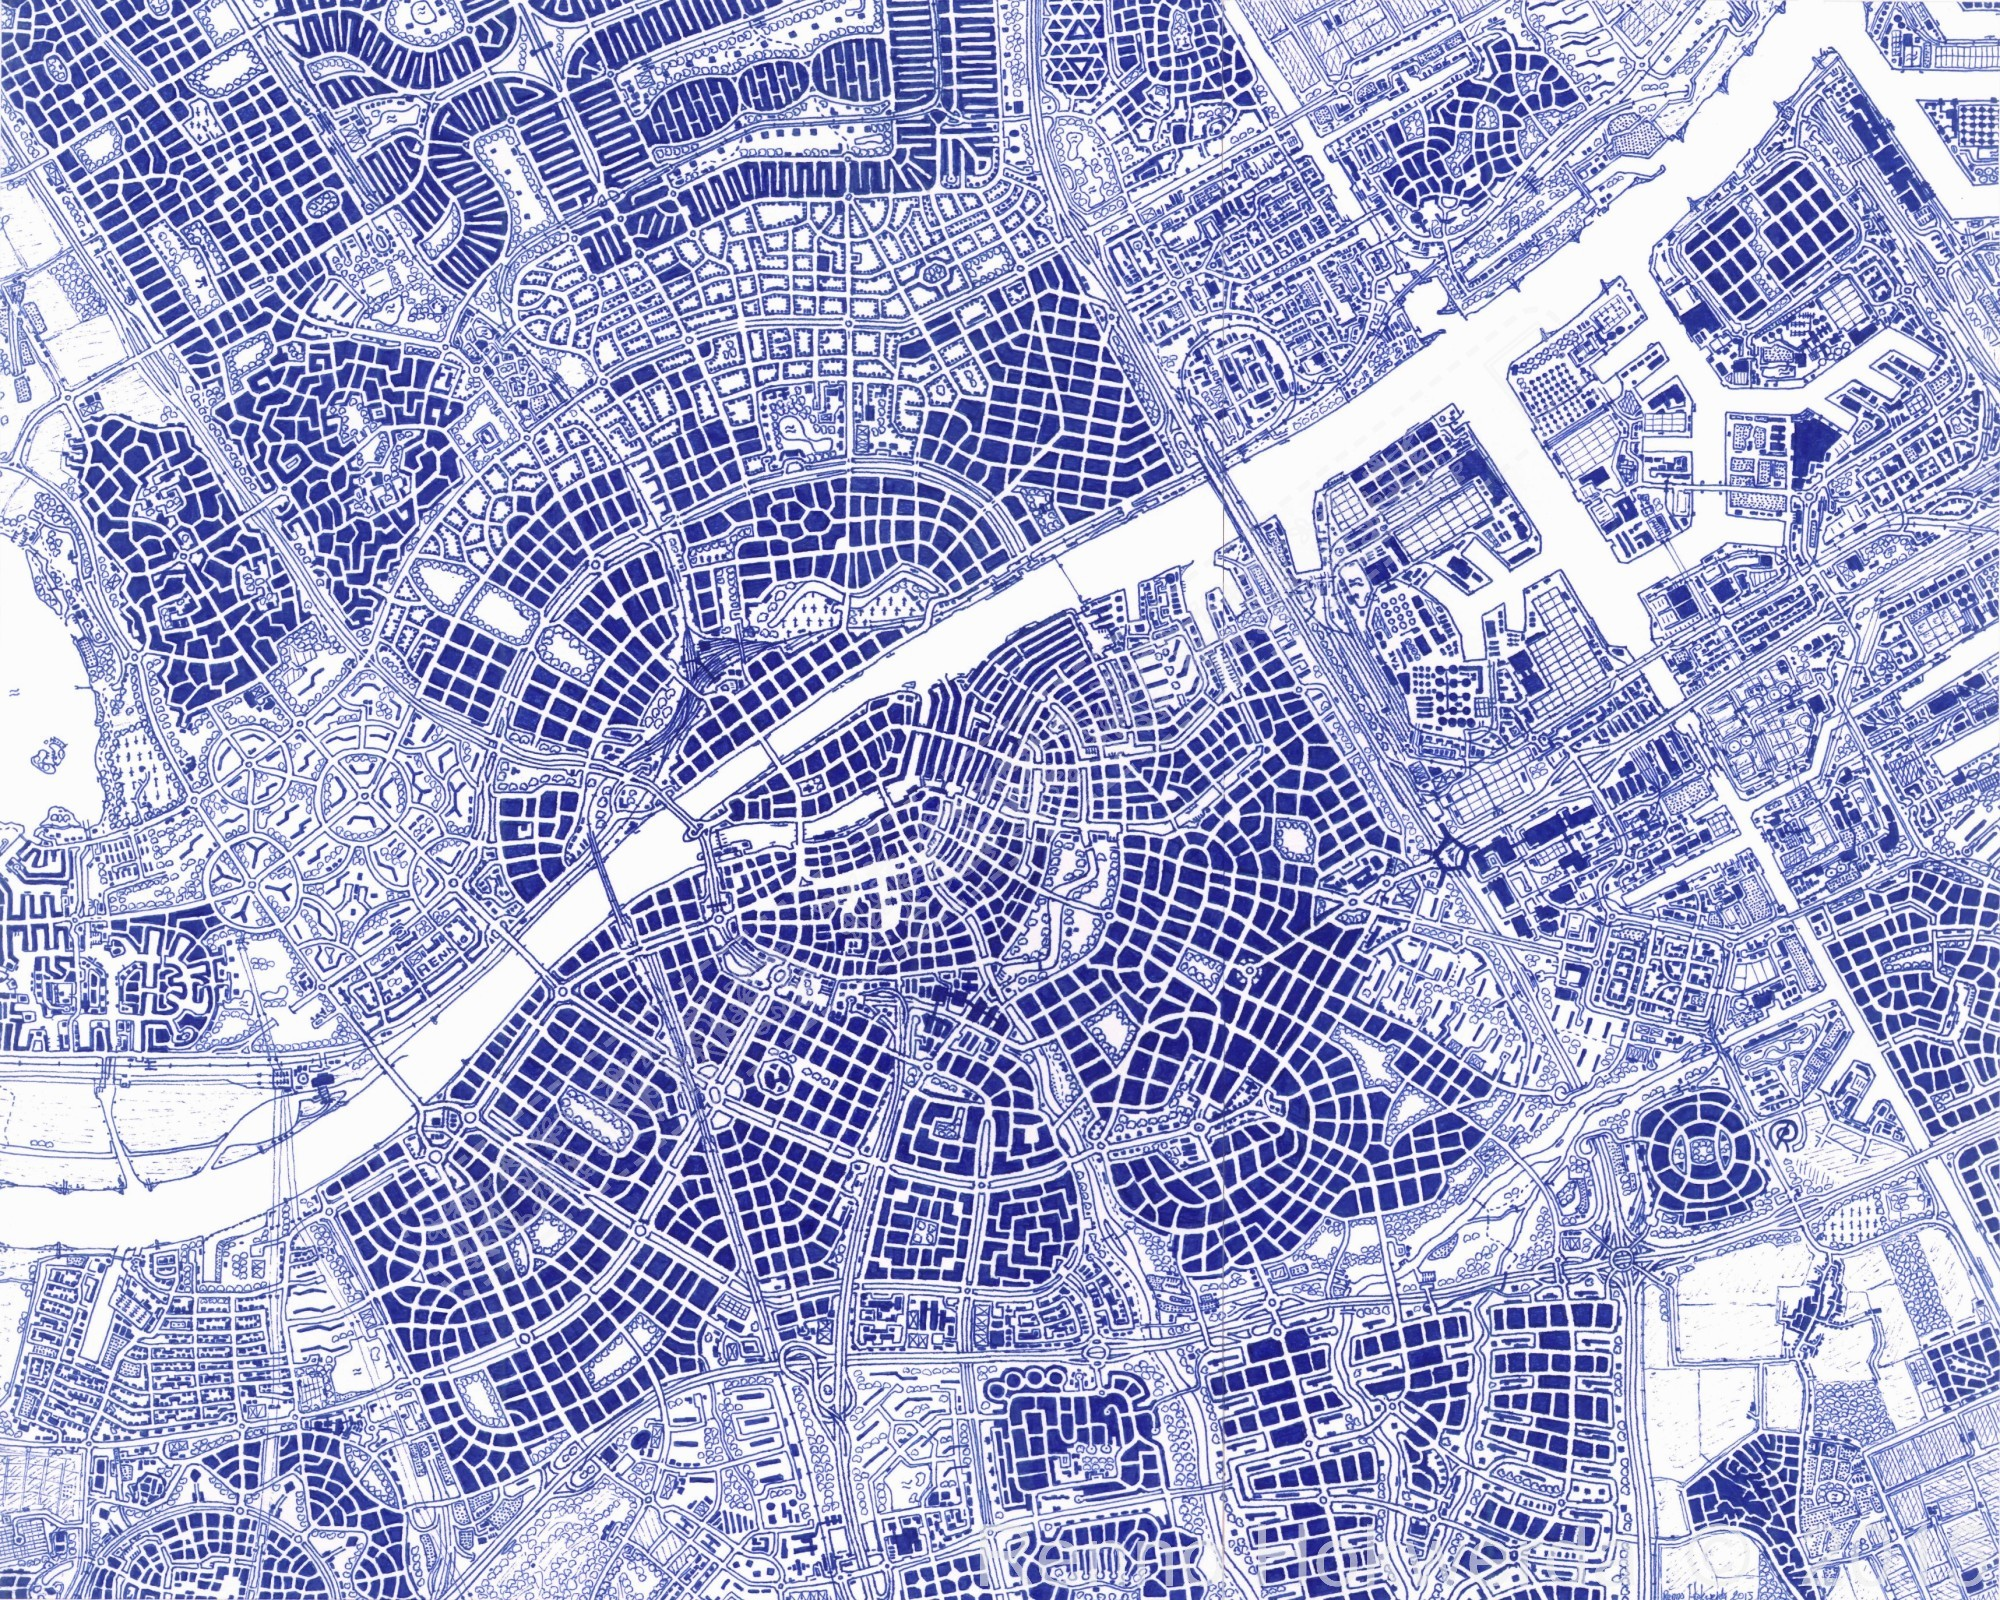 Zuverdam map (hand-drawn)